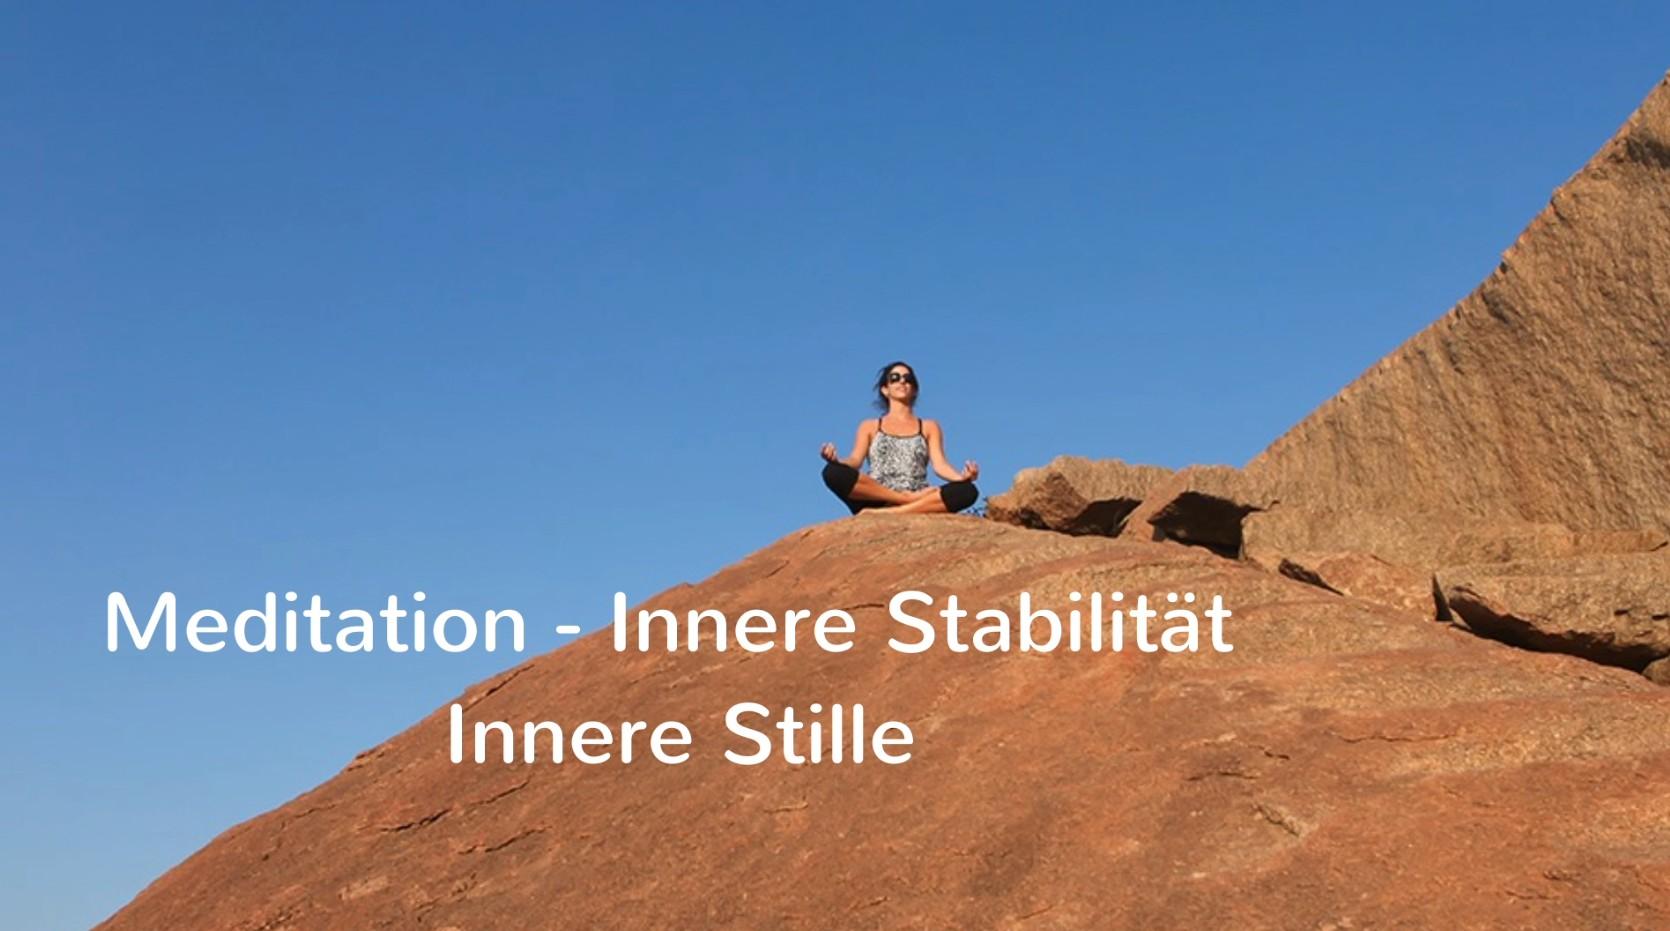 Meditation. Innere Stabilität